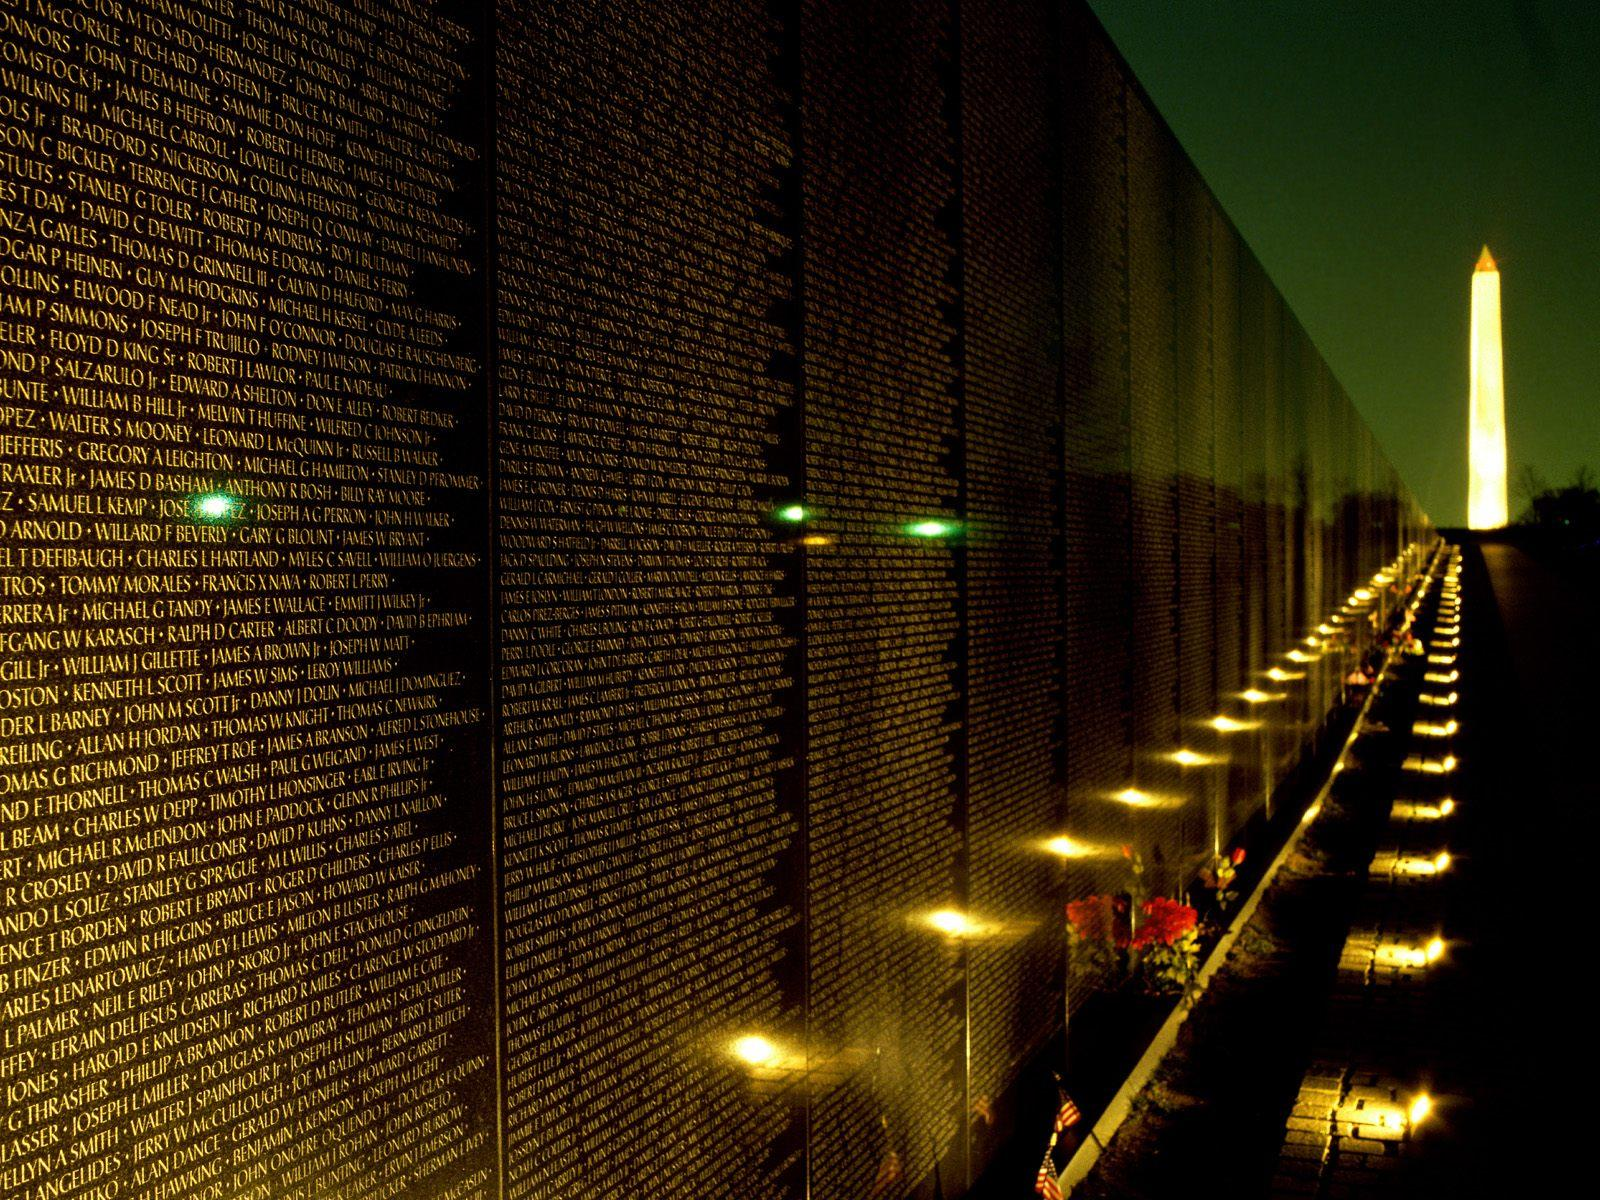 Best 48 Vietnam Veterans Memorial Wallpaper on HipWallpaper 1600x1200